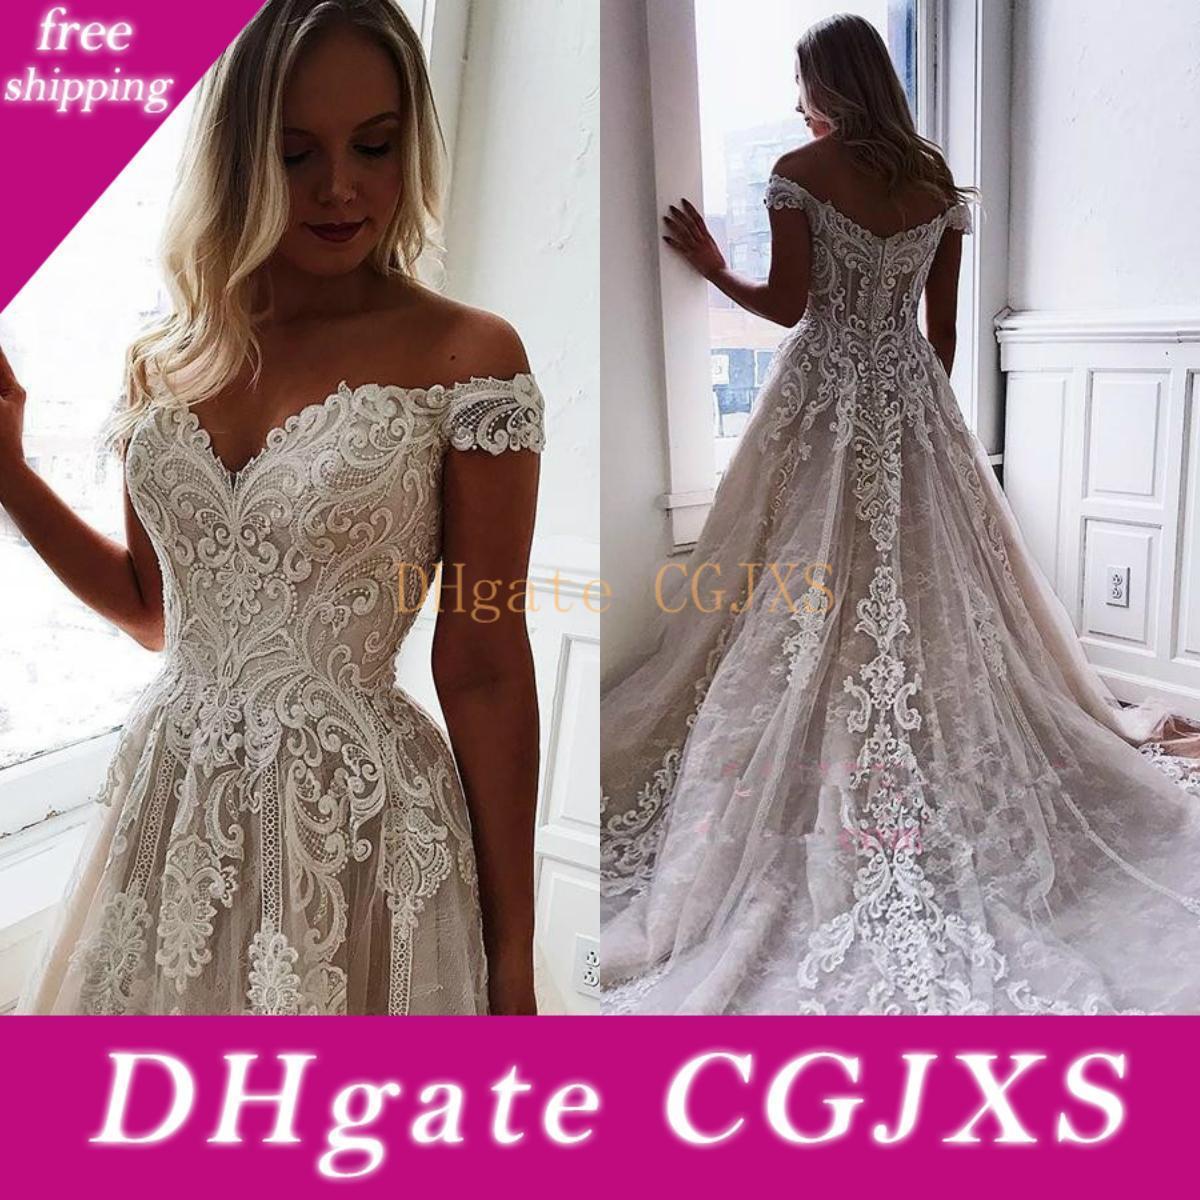 Elegant A Linha Alças Vestidos de noiva 2019 vestido de casamento Lace Appliqued vestidos de noiva Trem da varredura Tulle Praia ocidental Robe De Soriee